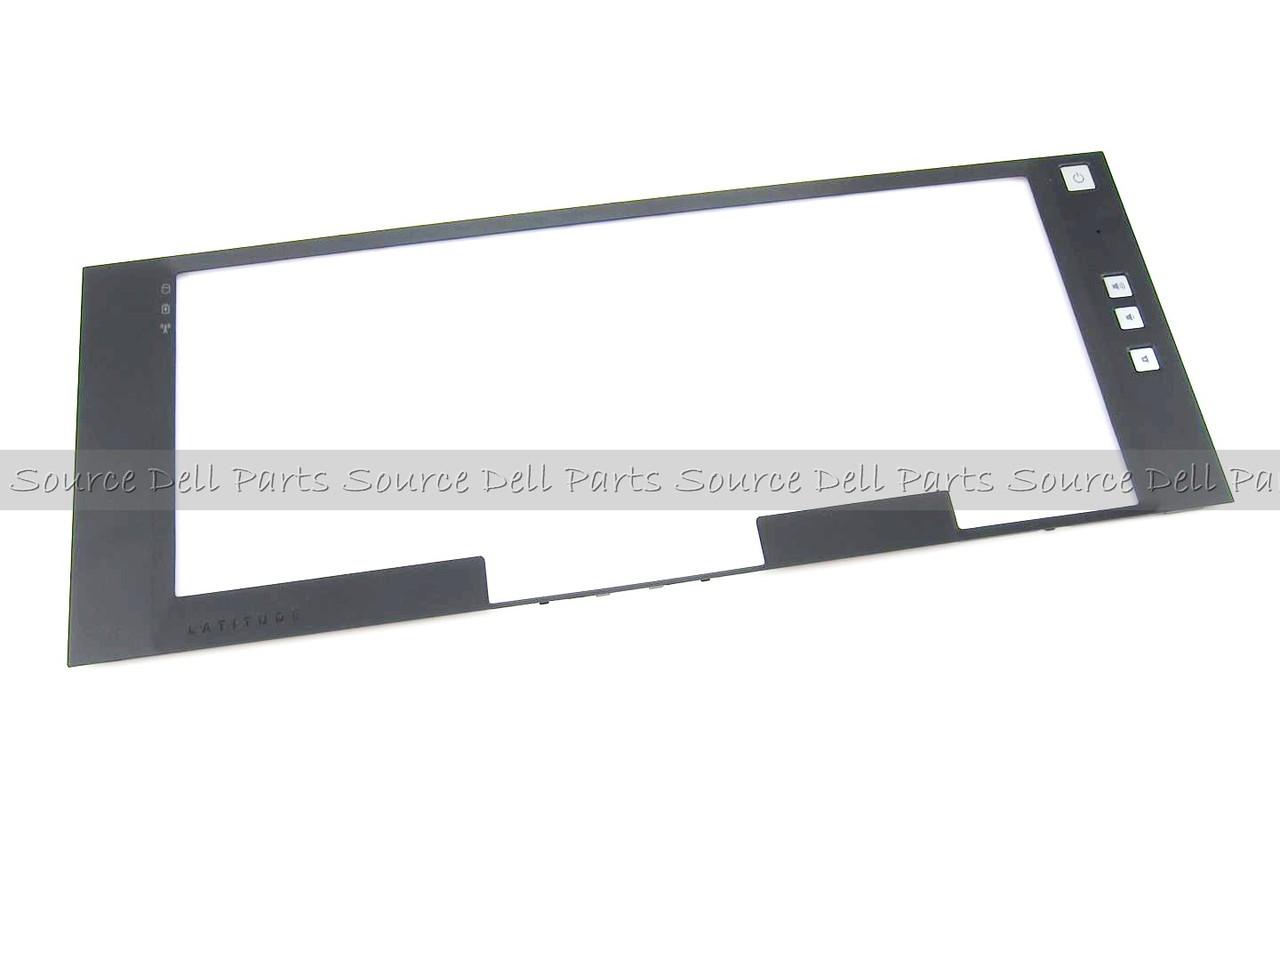 Dell Latitude E5420 Dual Point Keyboard Bezel Trim Overlay - 0K9Y9